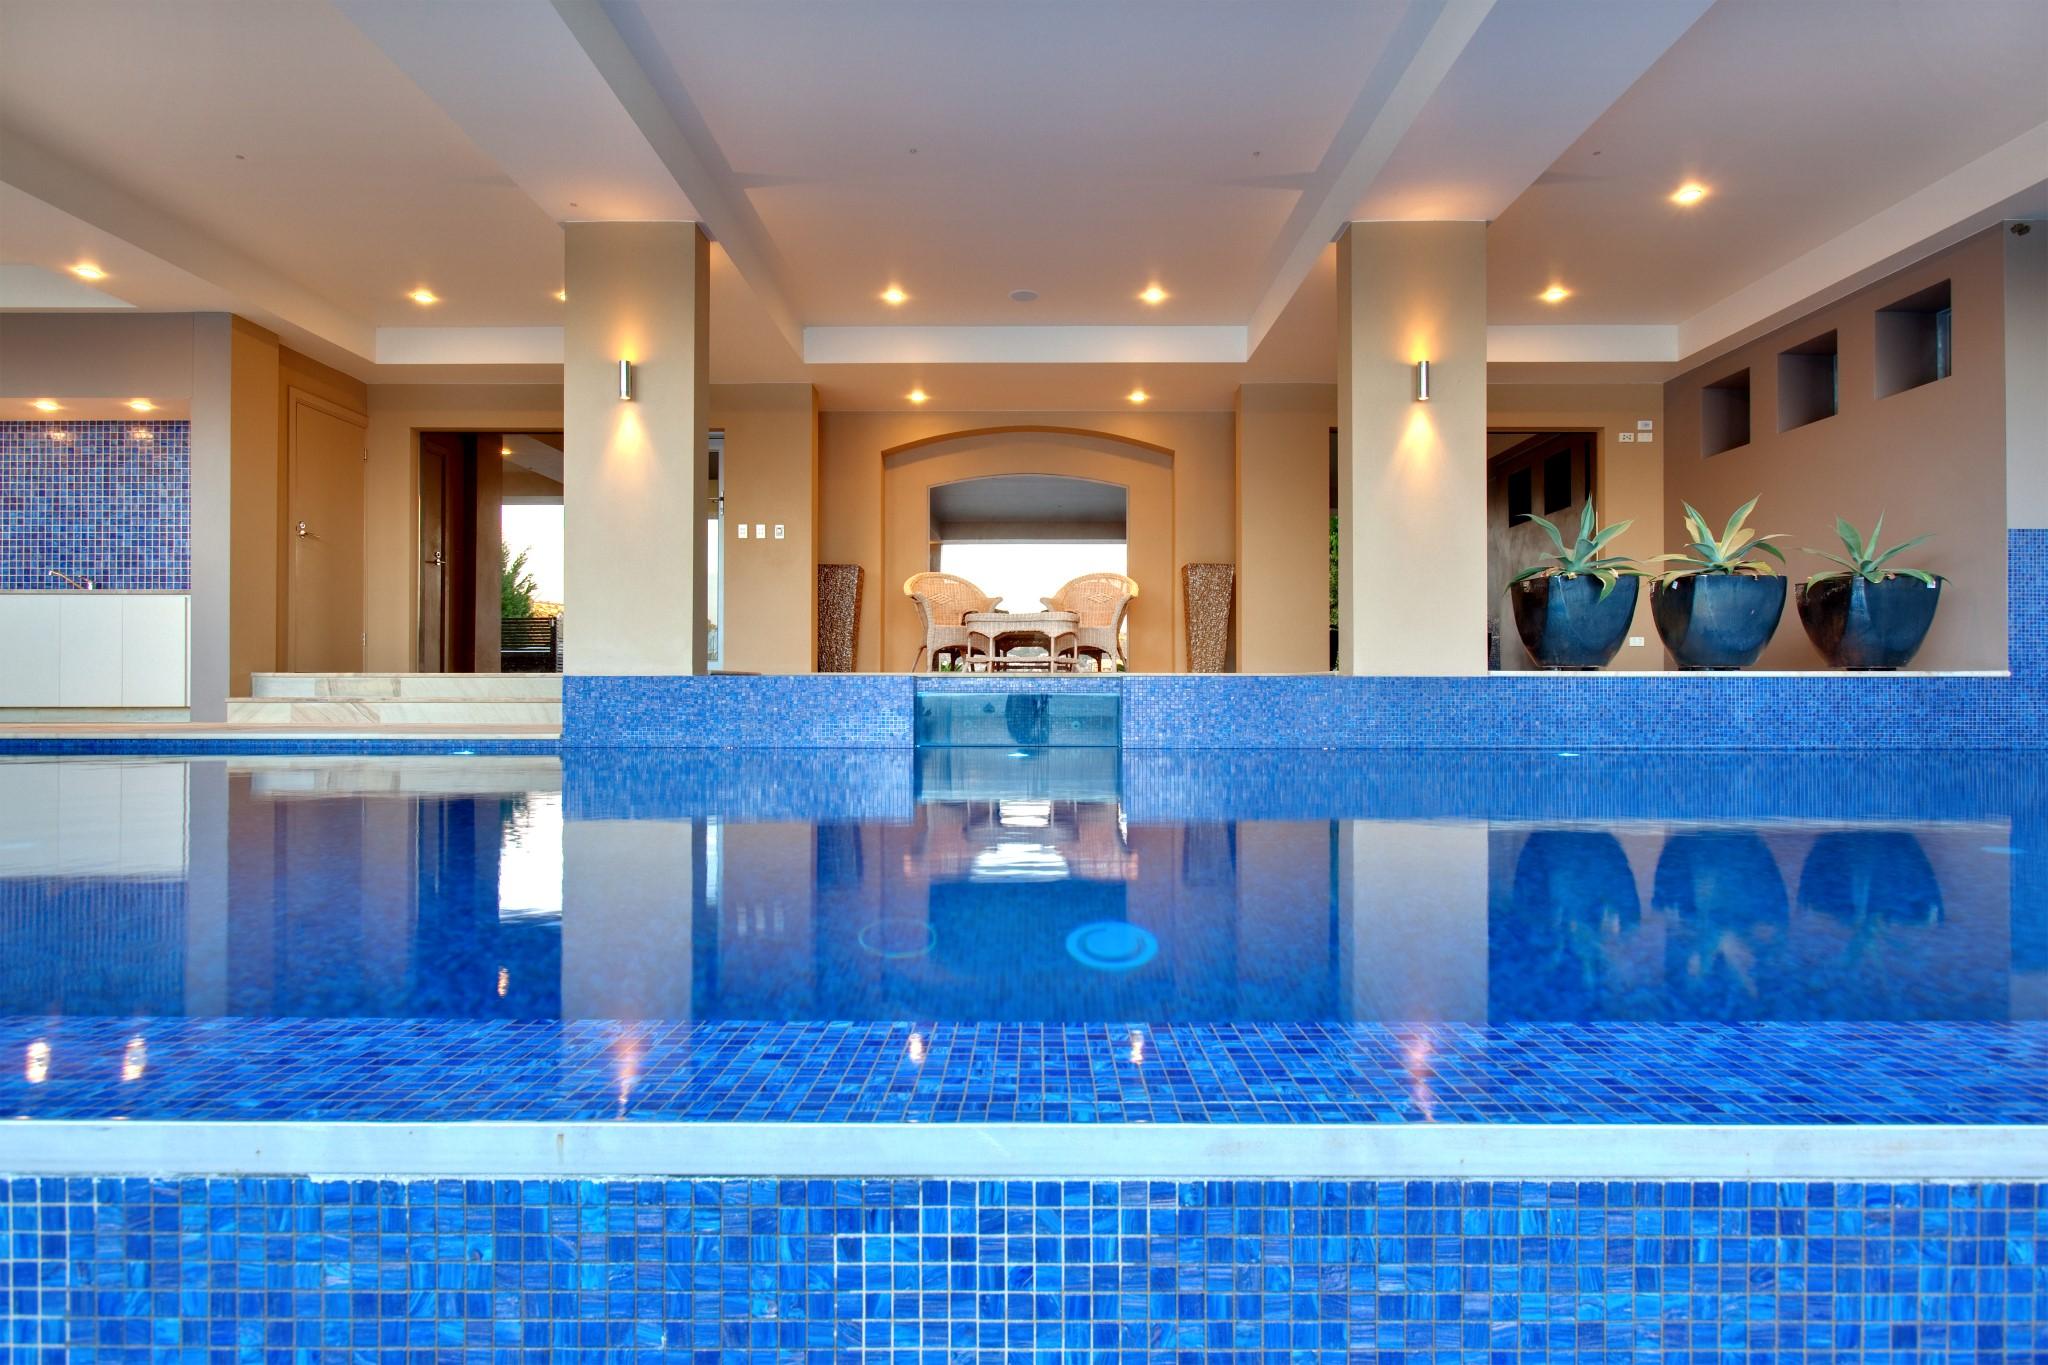 Infinity Edge Swimming Pool of the luxury house